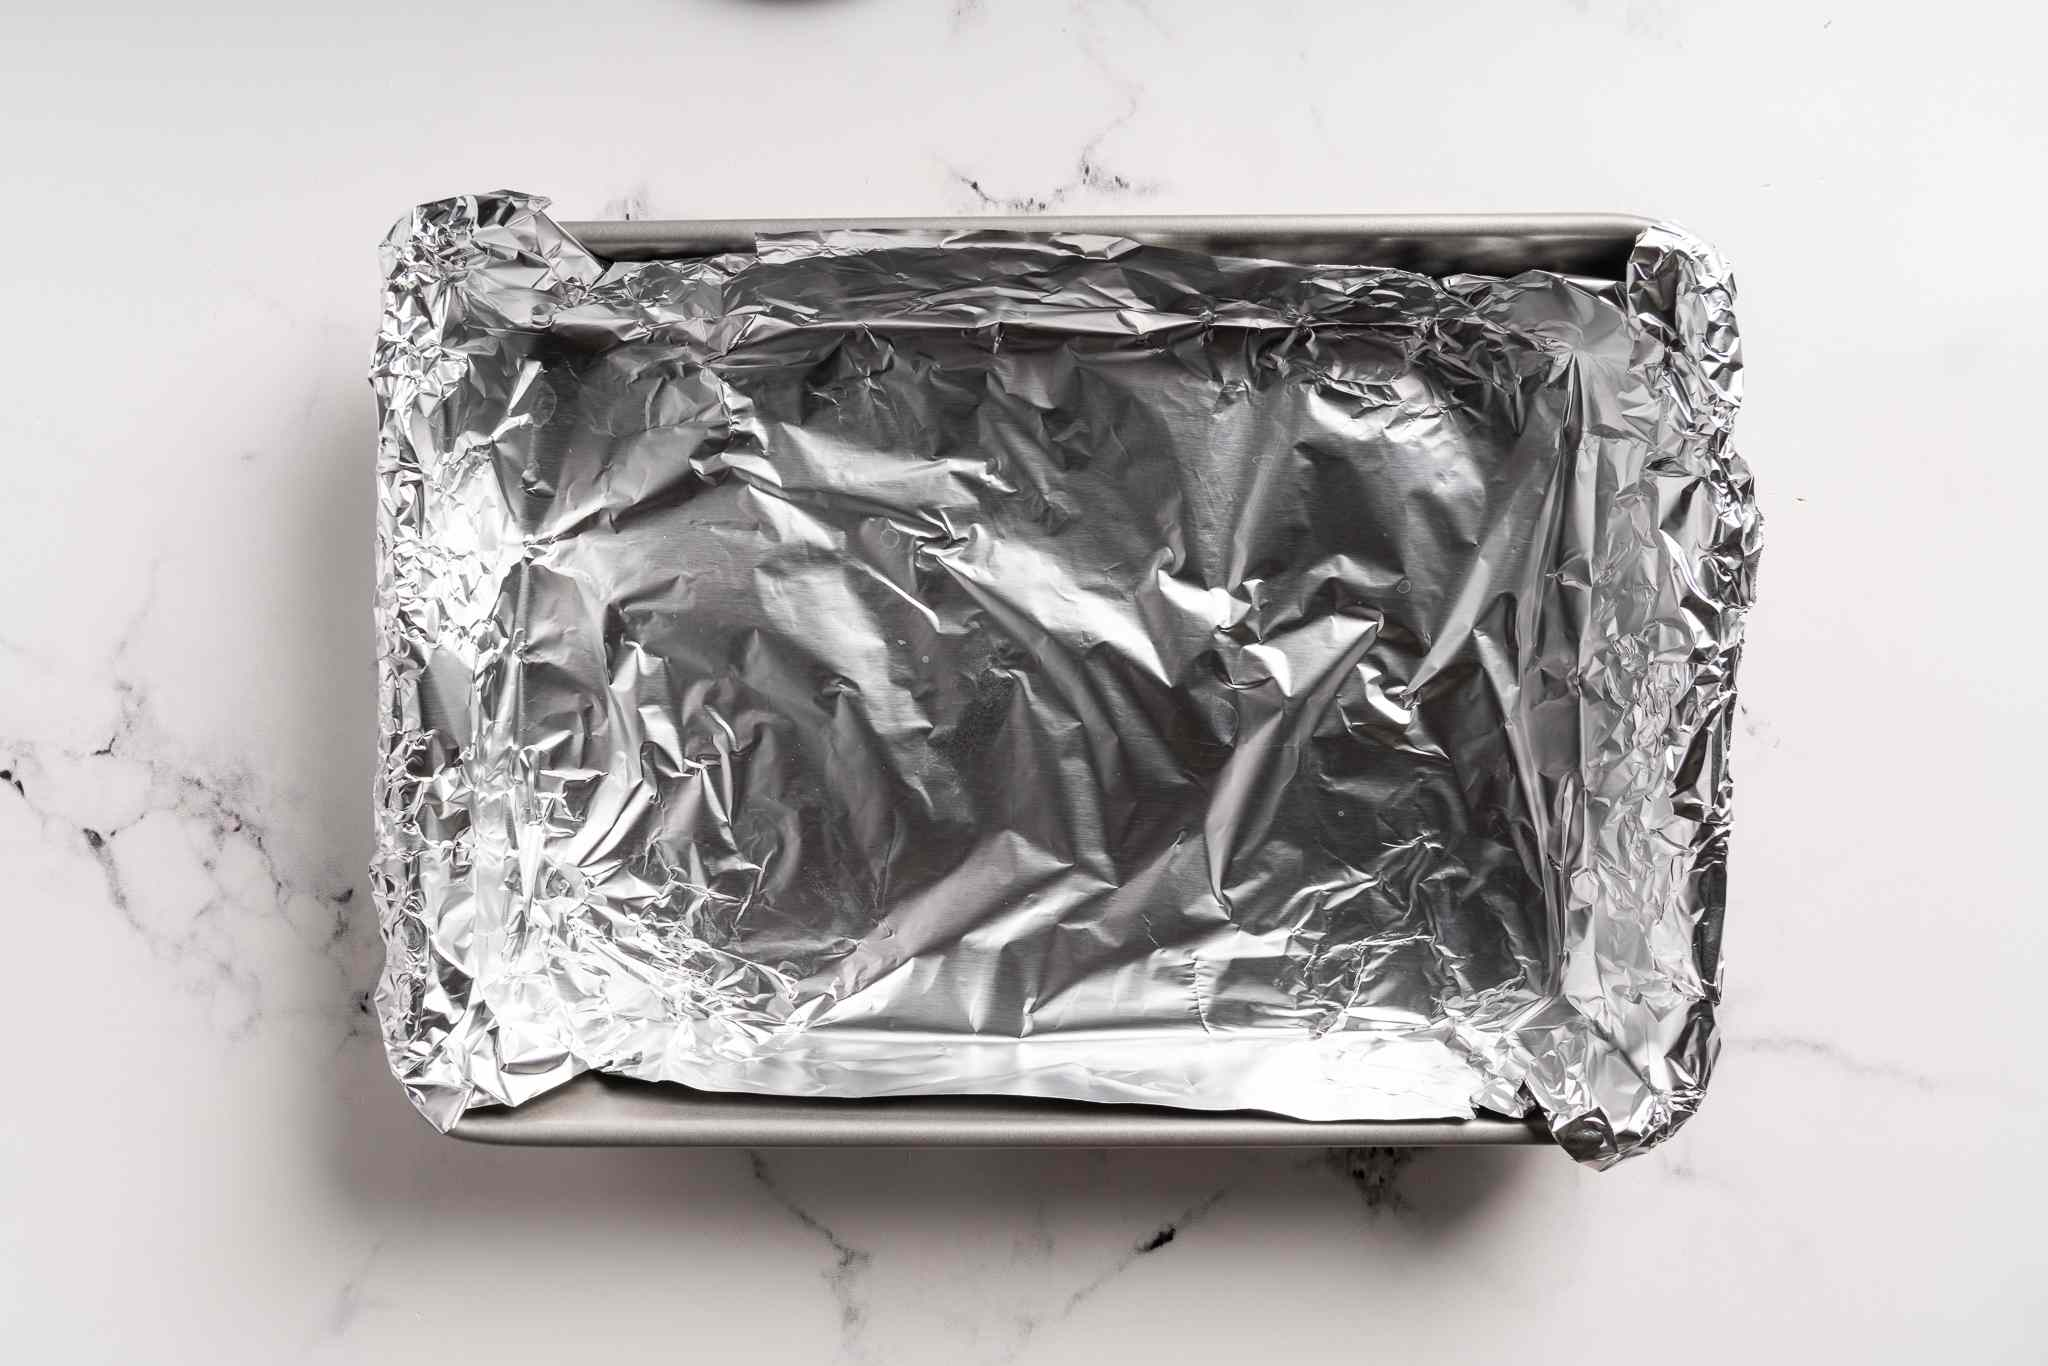 aluminum foil lined baking dish